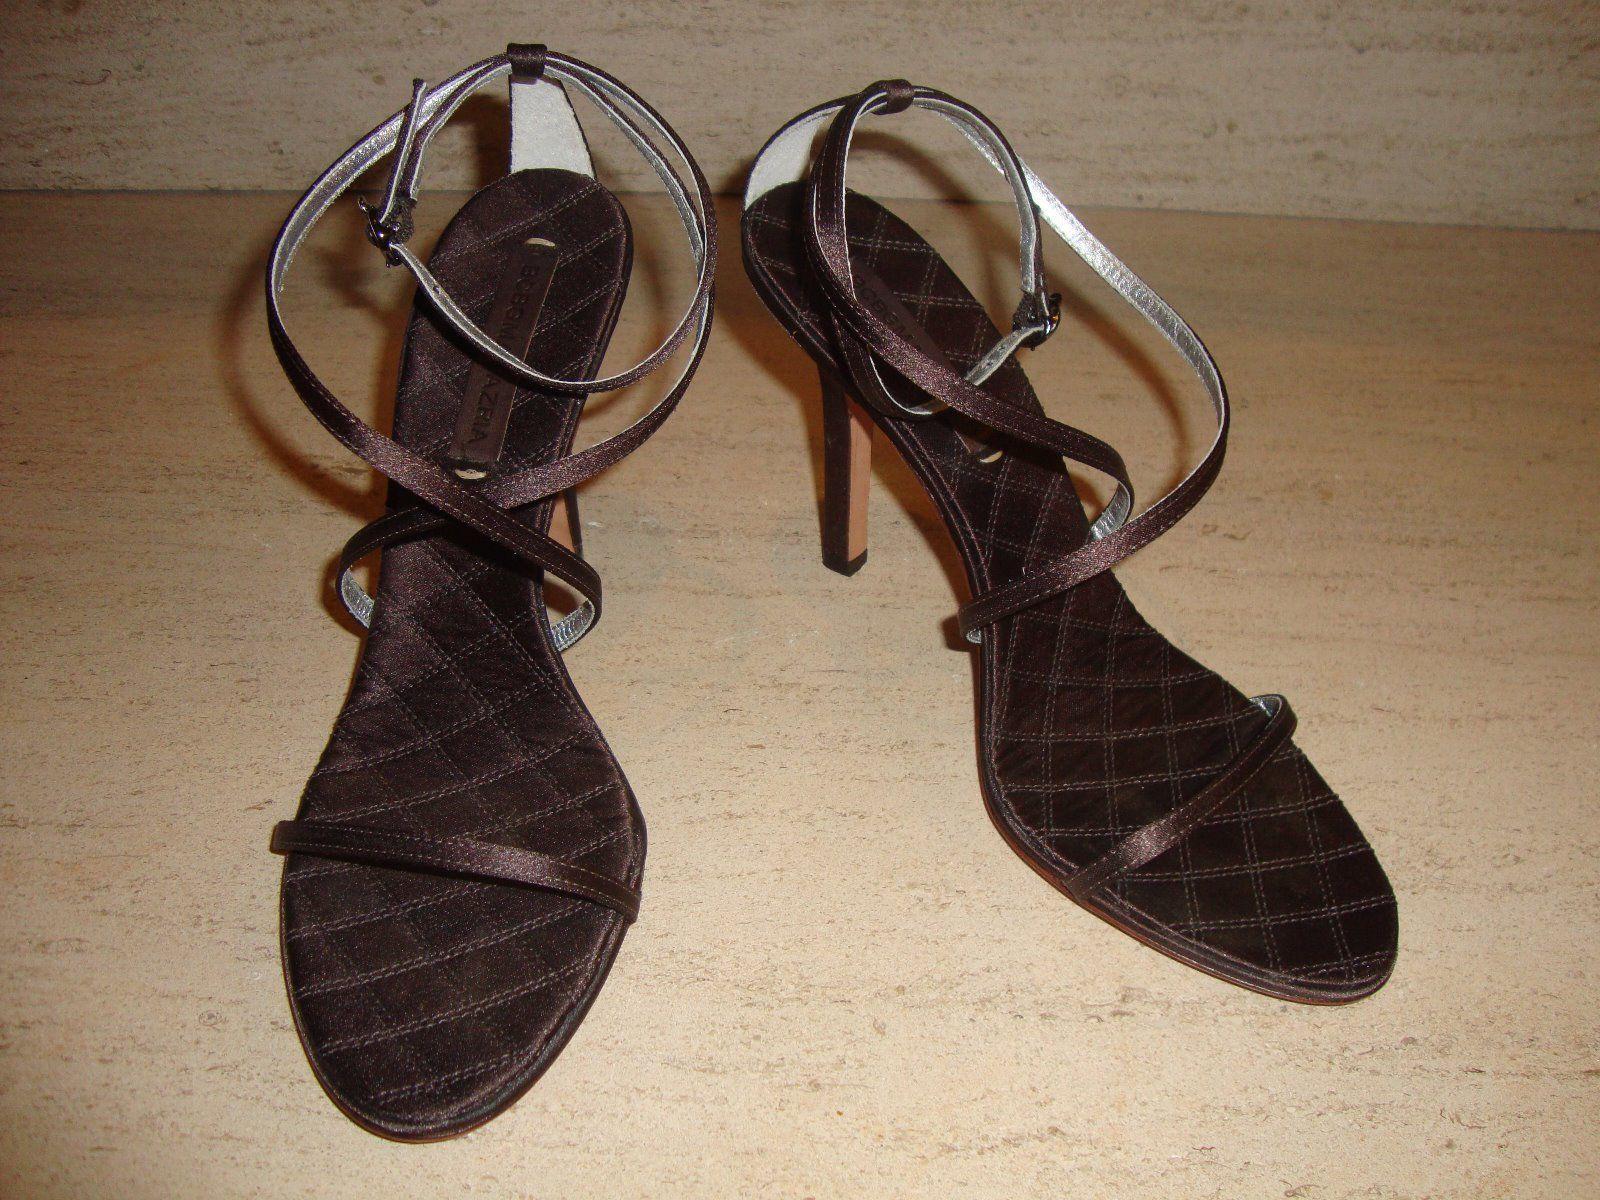 b5dbf9a93b8 Gorgeous $198 Brown Bcbg Max Aria Sandals and similar items